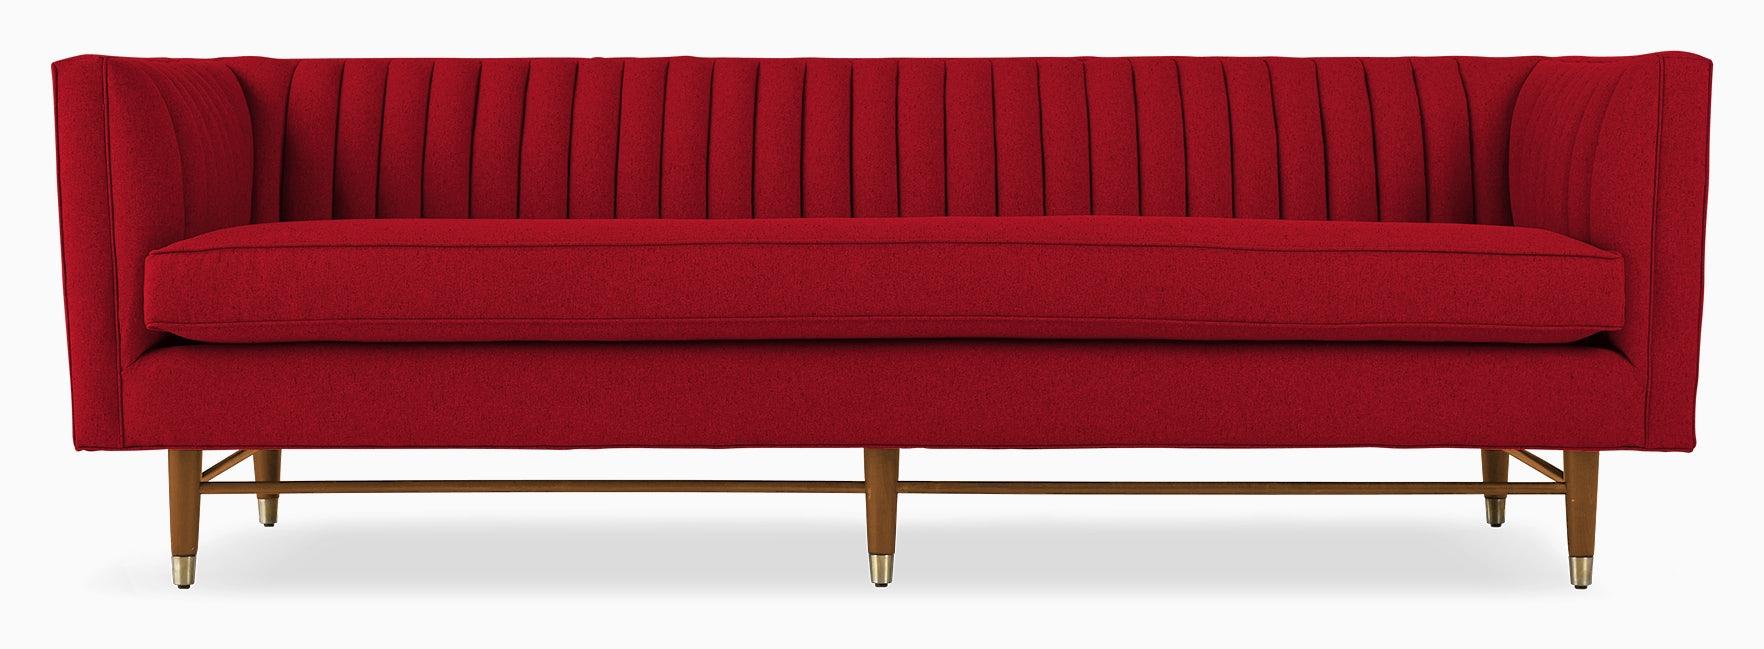 chelsea sofa key largo ruby